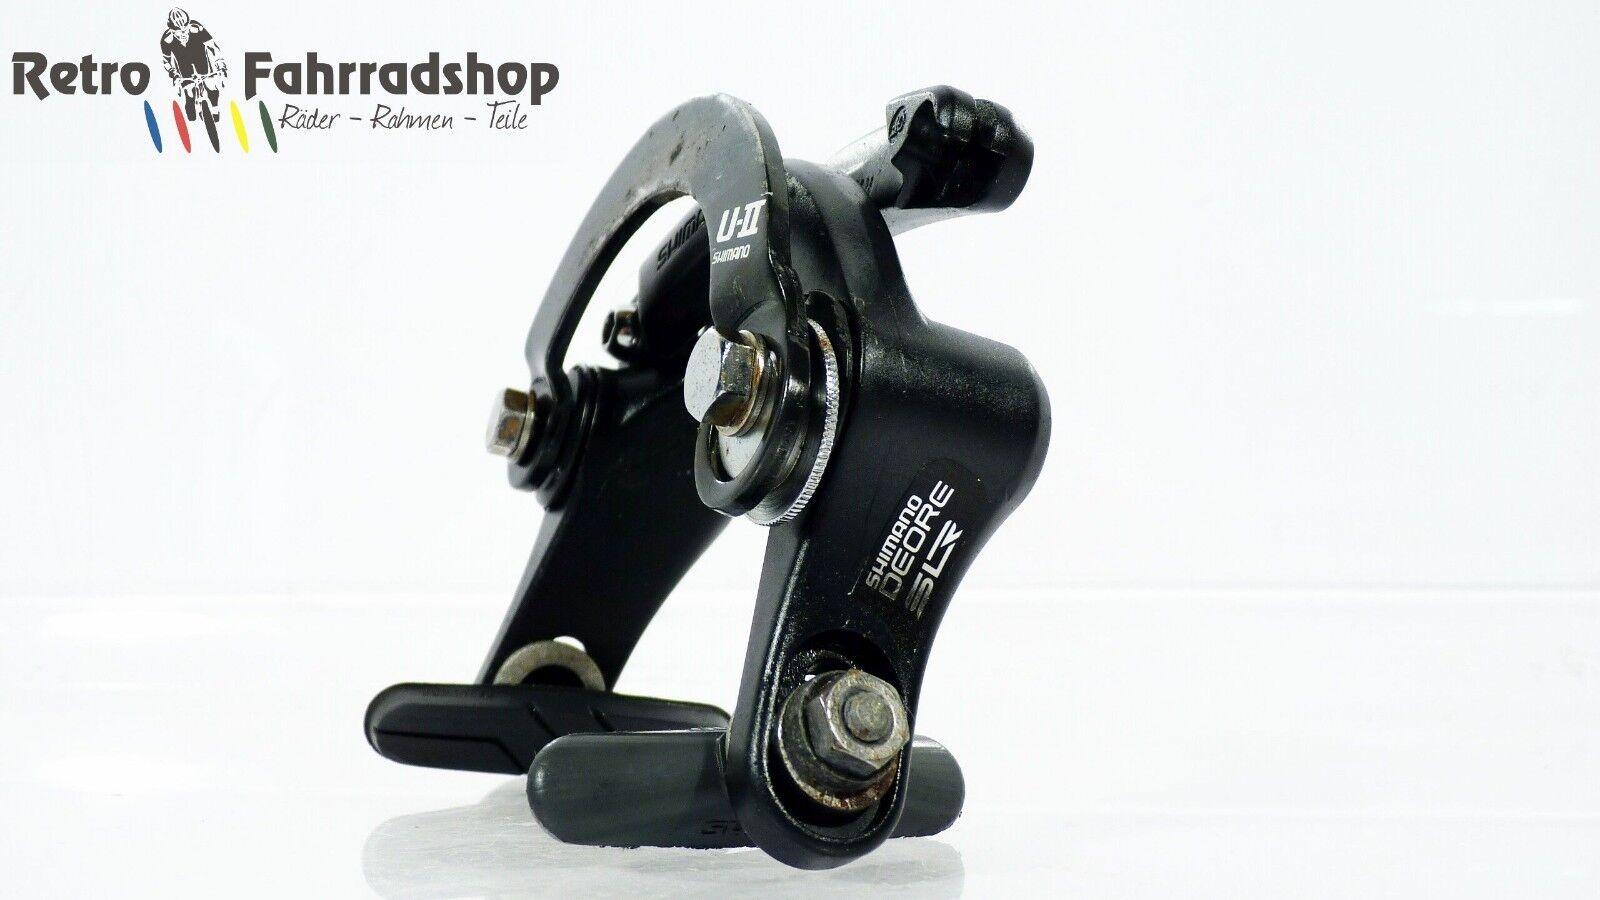 Blacke Shimano Deore DX BR-MT63 U-Brake Bremse KULT Retro BJ 1990 TOP RAR 329g